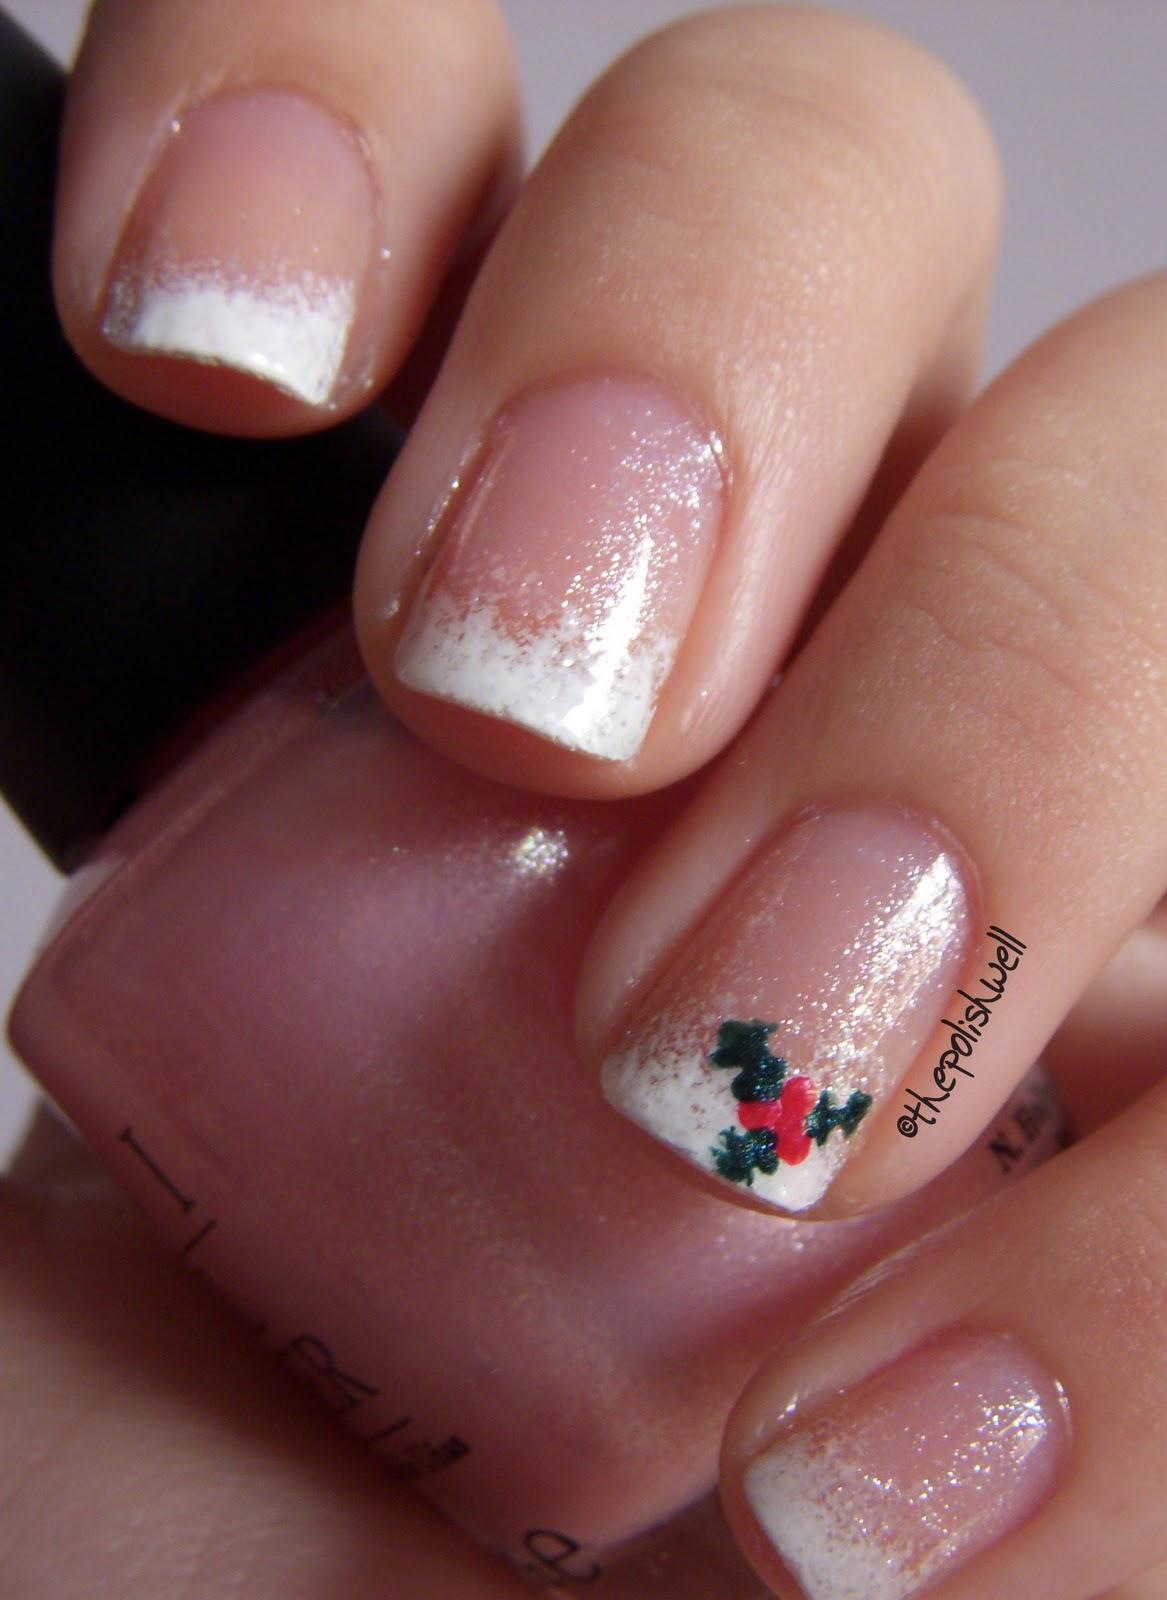 12 Days Of Christmas Day 2 Mistletoe French Nail Art